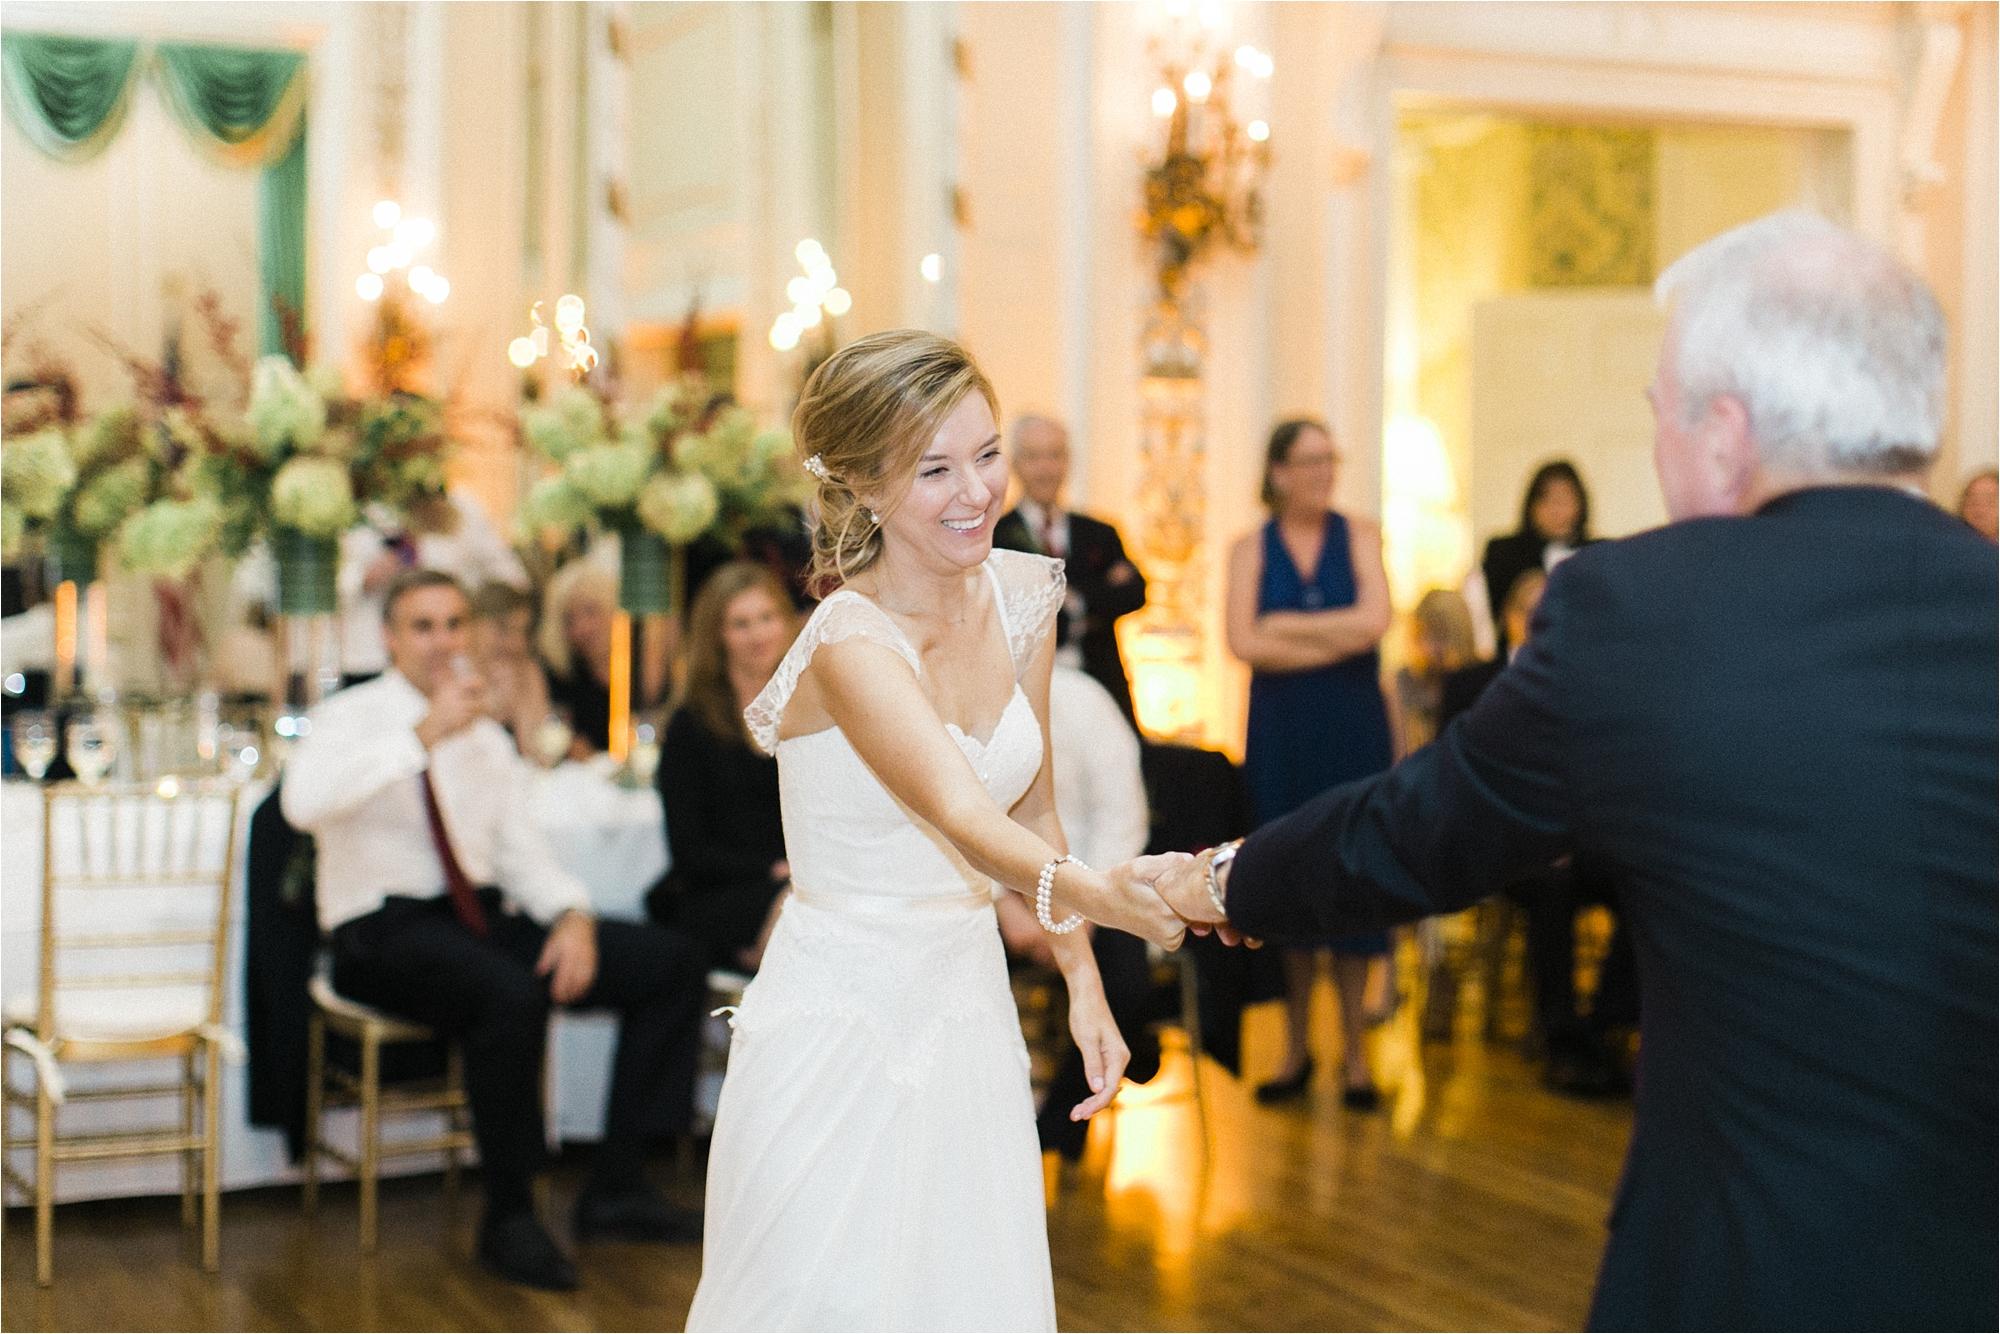 stephanie-yonce-photography-elegant-private-club-washington-dc-wedding-photos_0057.jpg